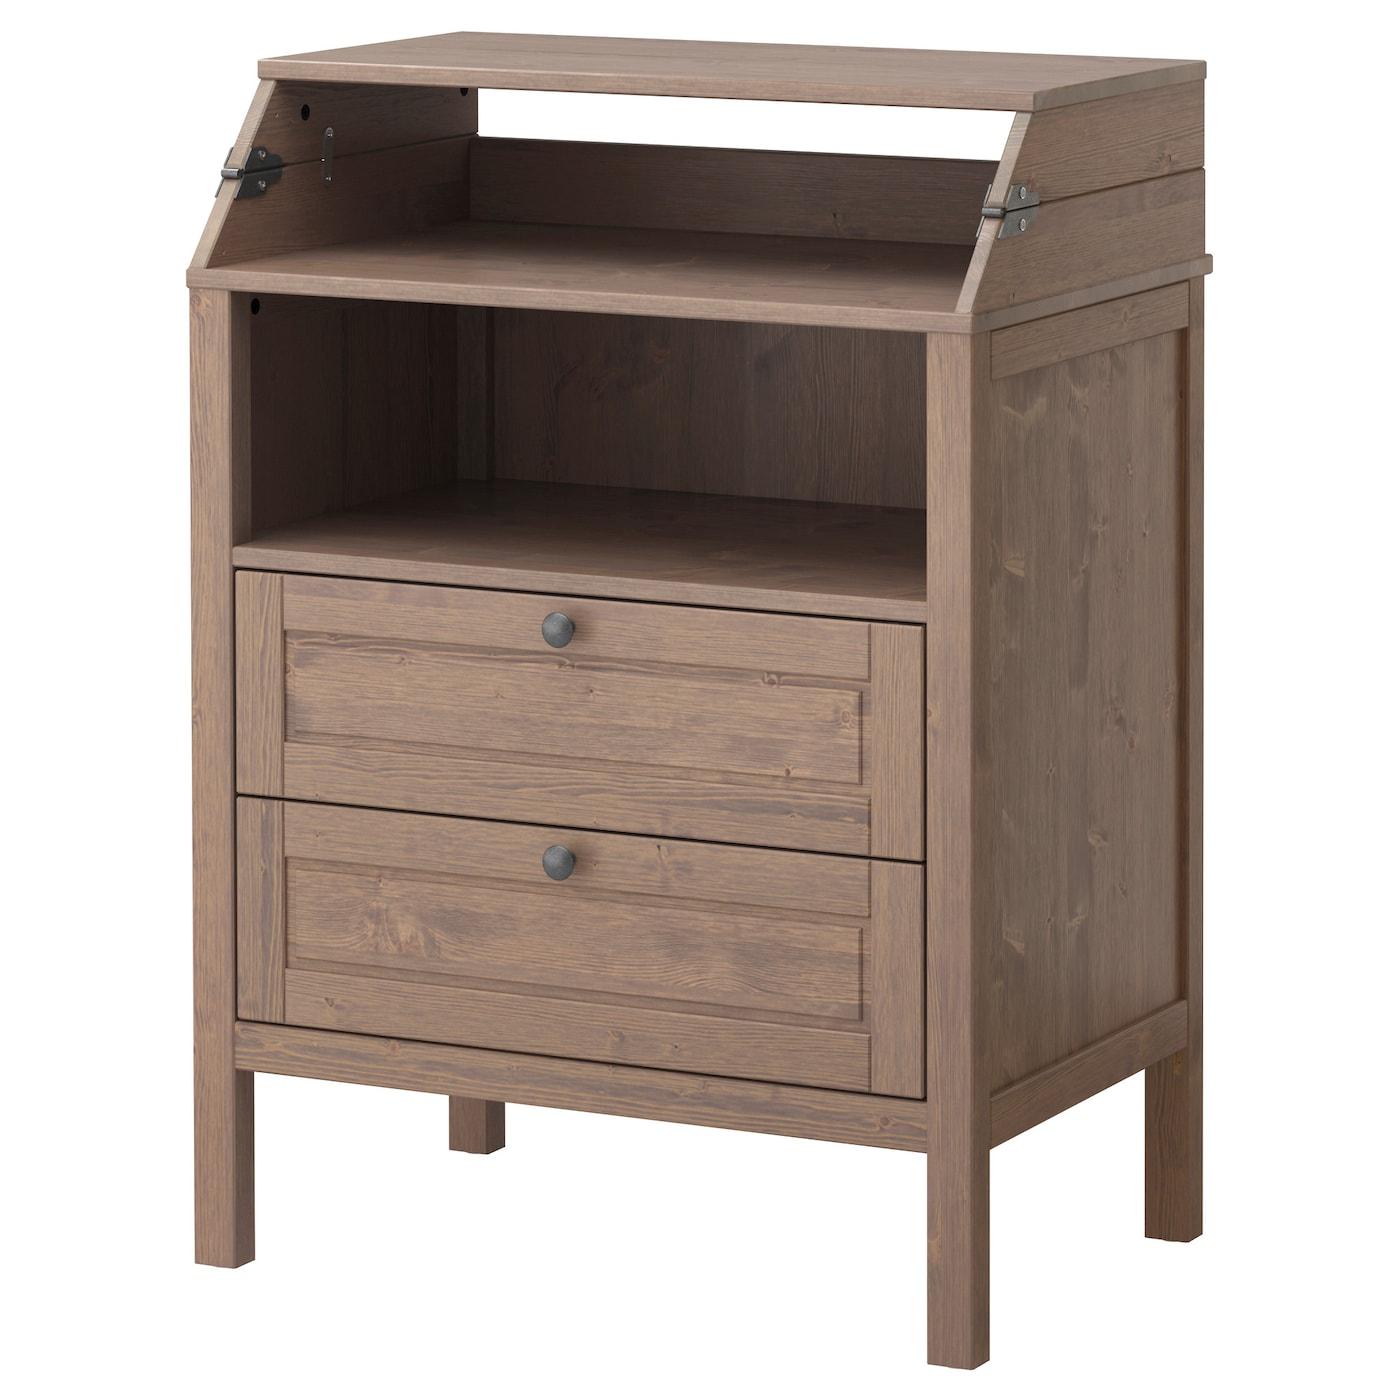 sundvik changing table chest of drawers grey brown ikea. Black Bedroom Furniture Sets. Home Design Ideas